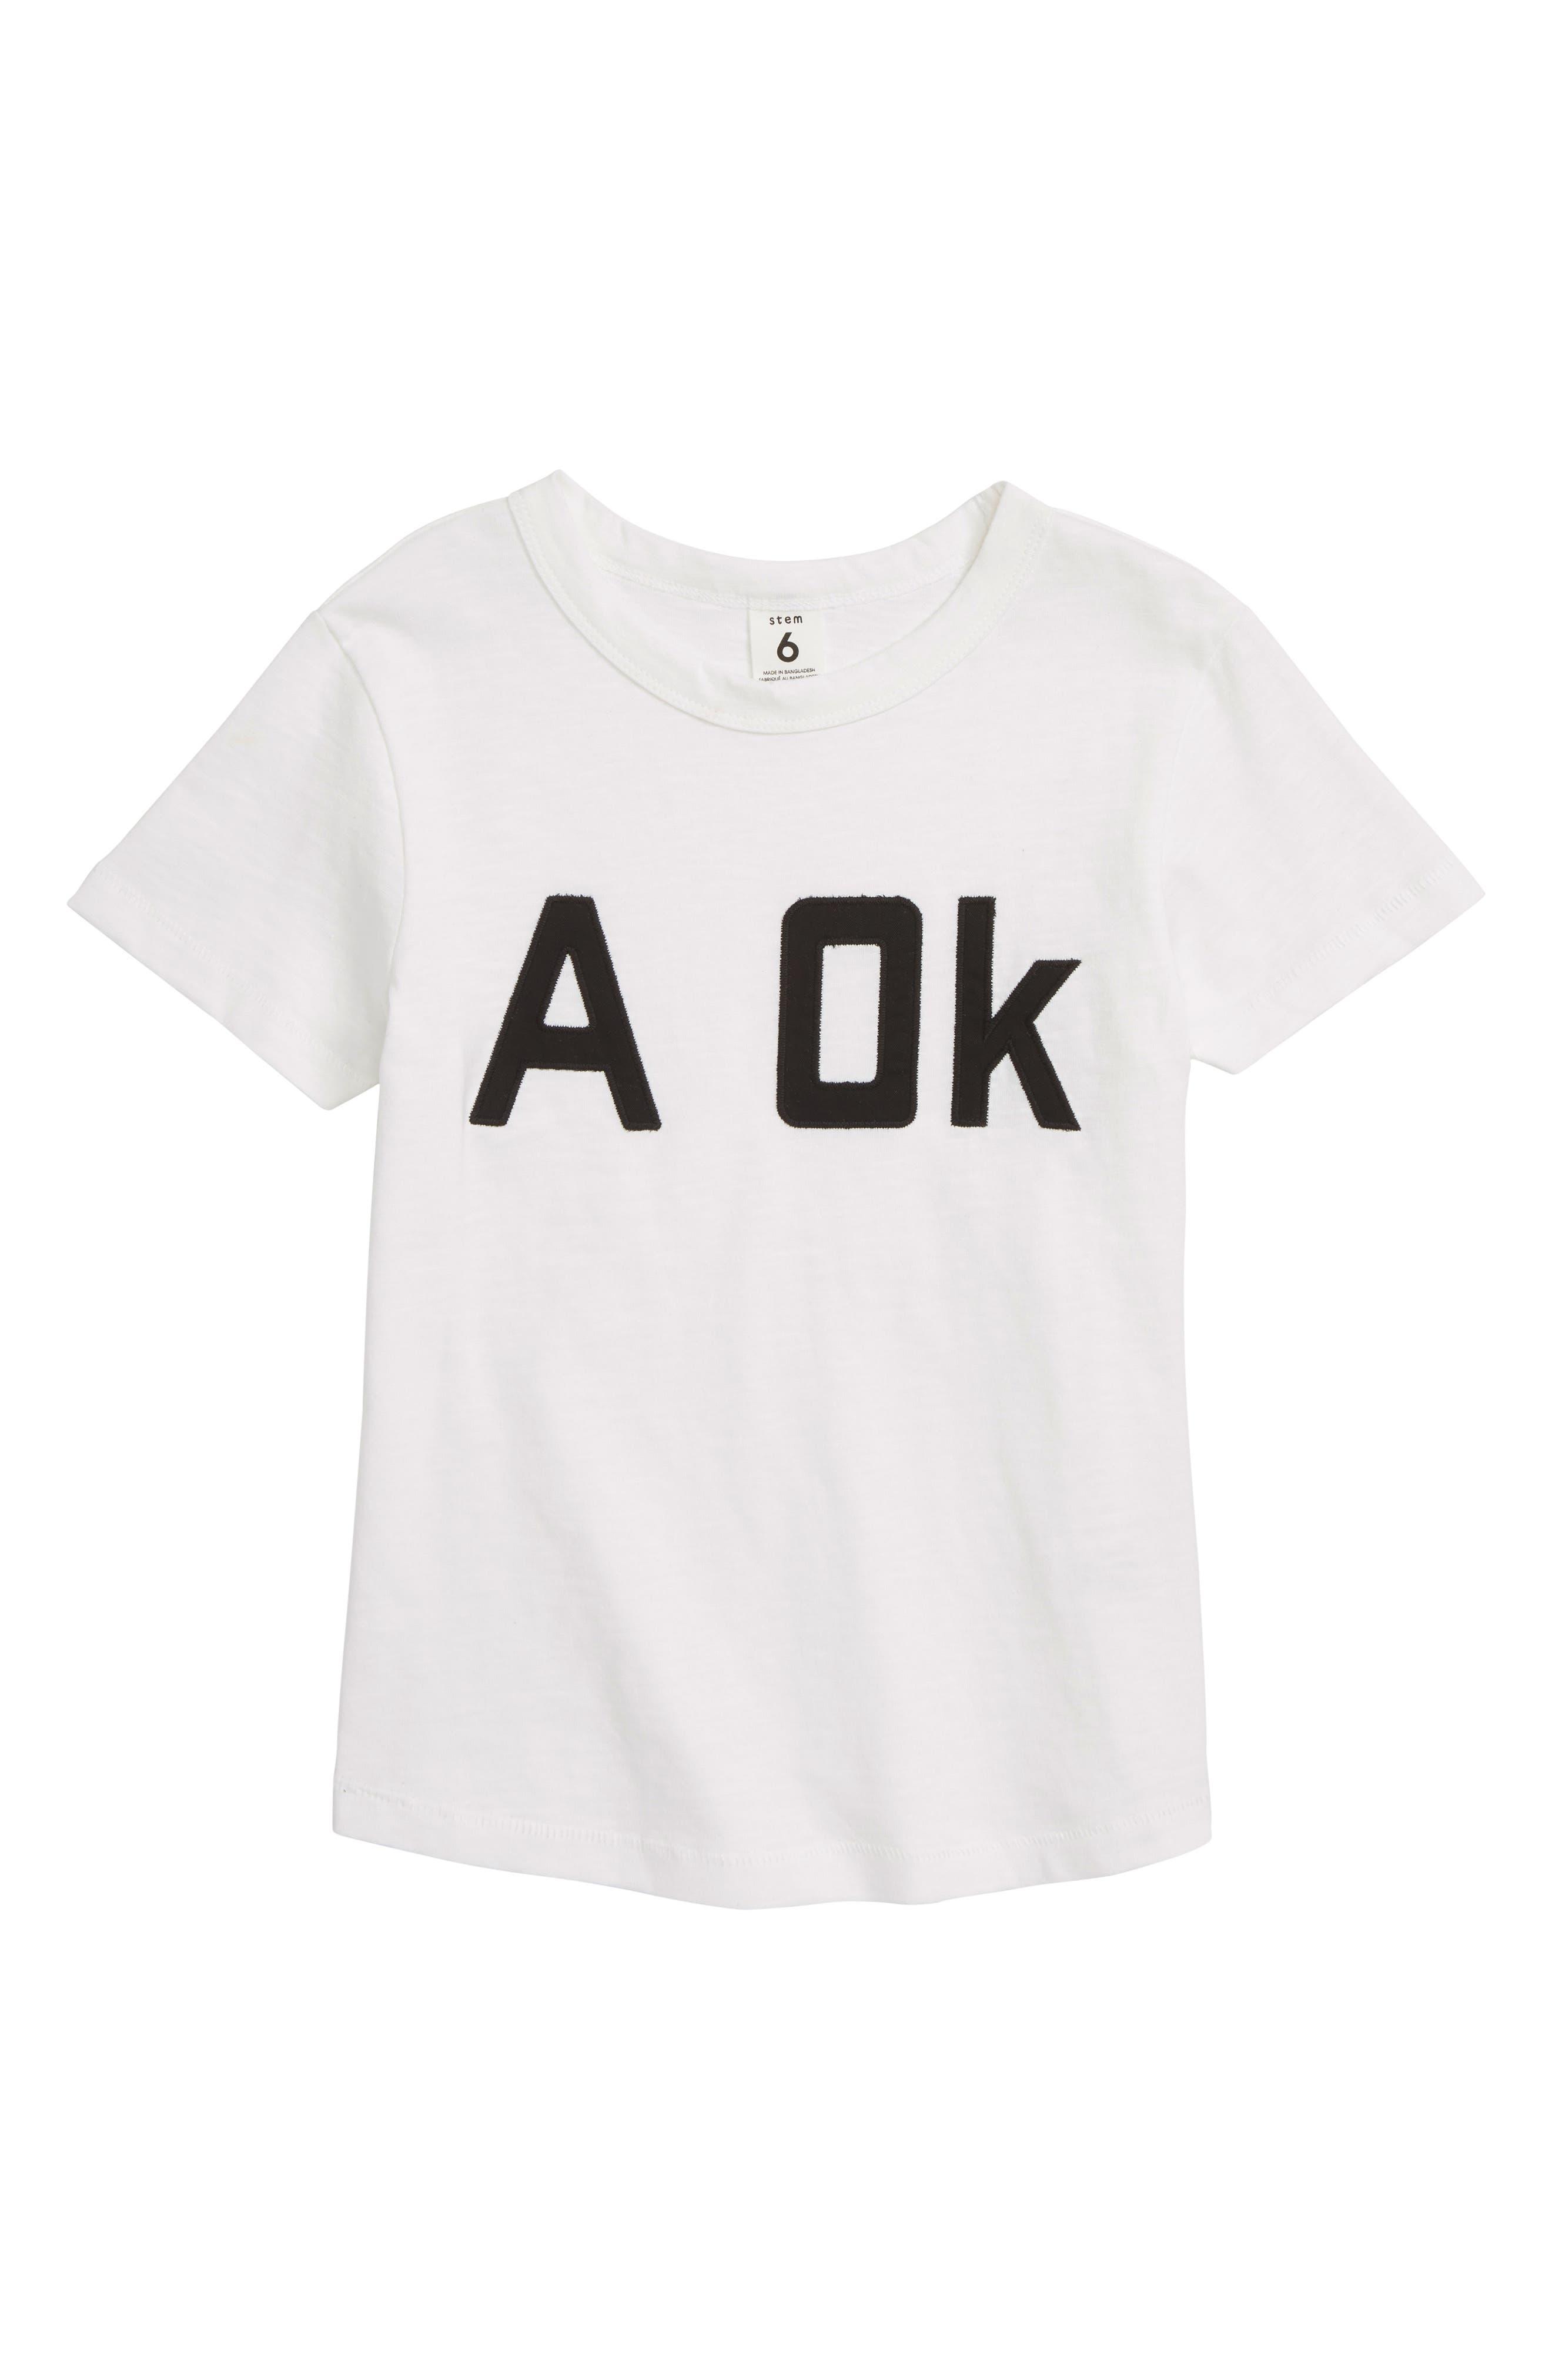 Free Space Appliqué T-Shirt,                             Main thumbnail 1, color,                             White A Ok